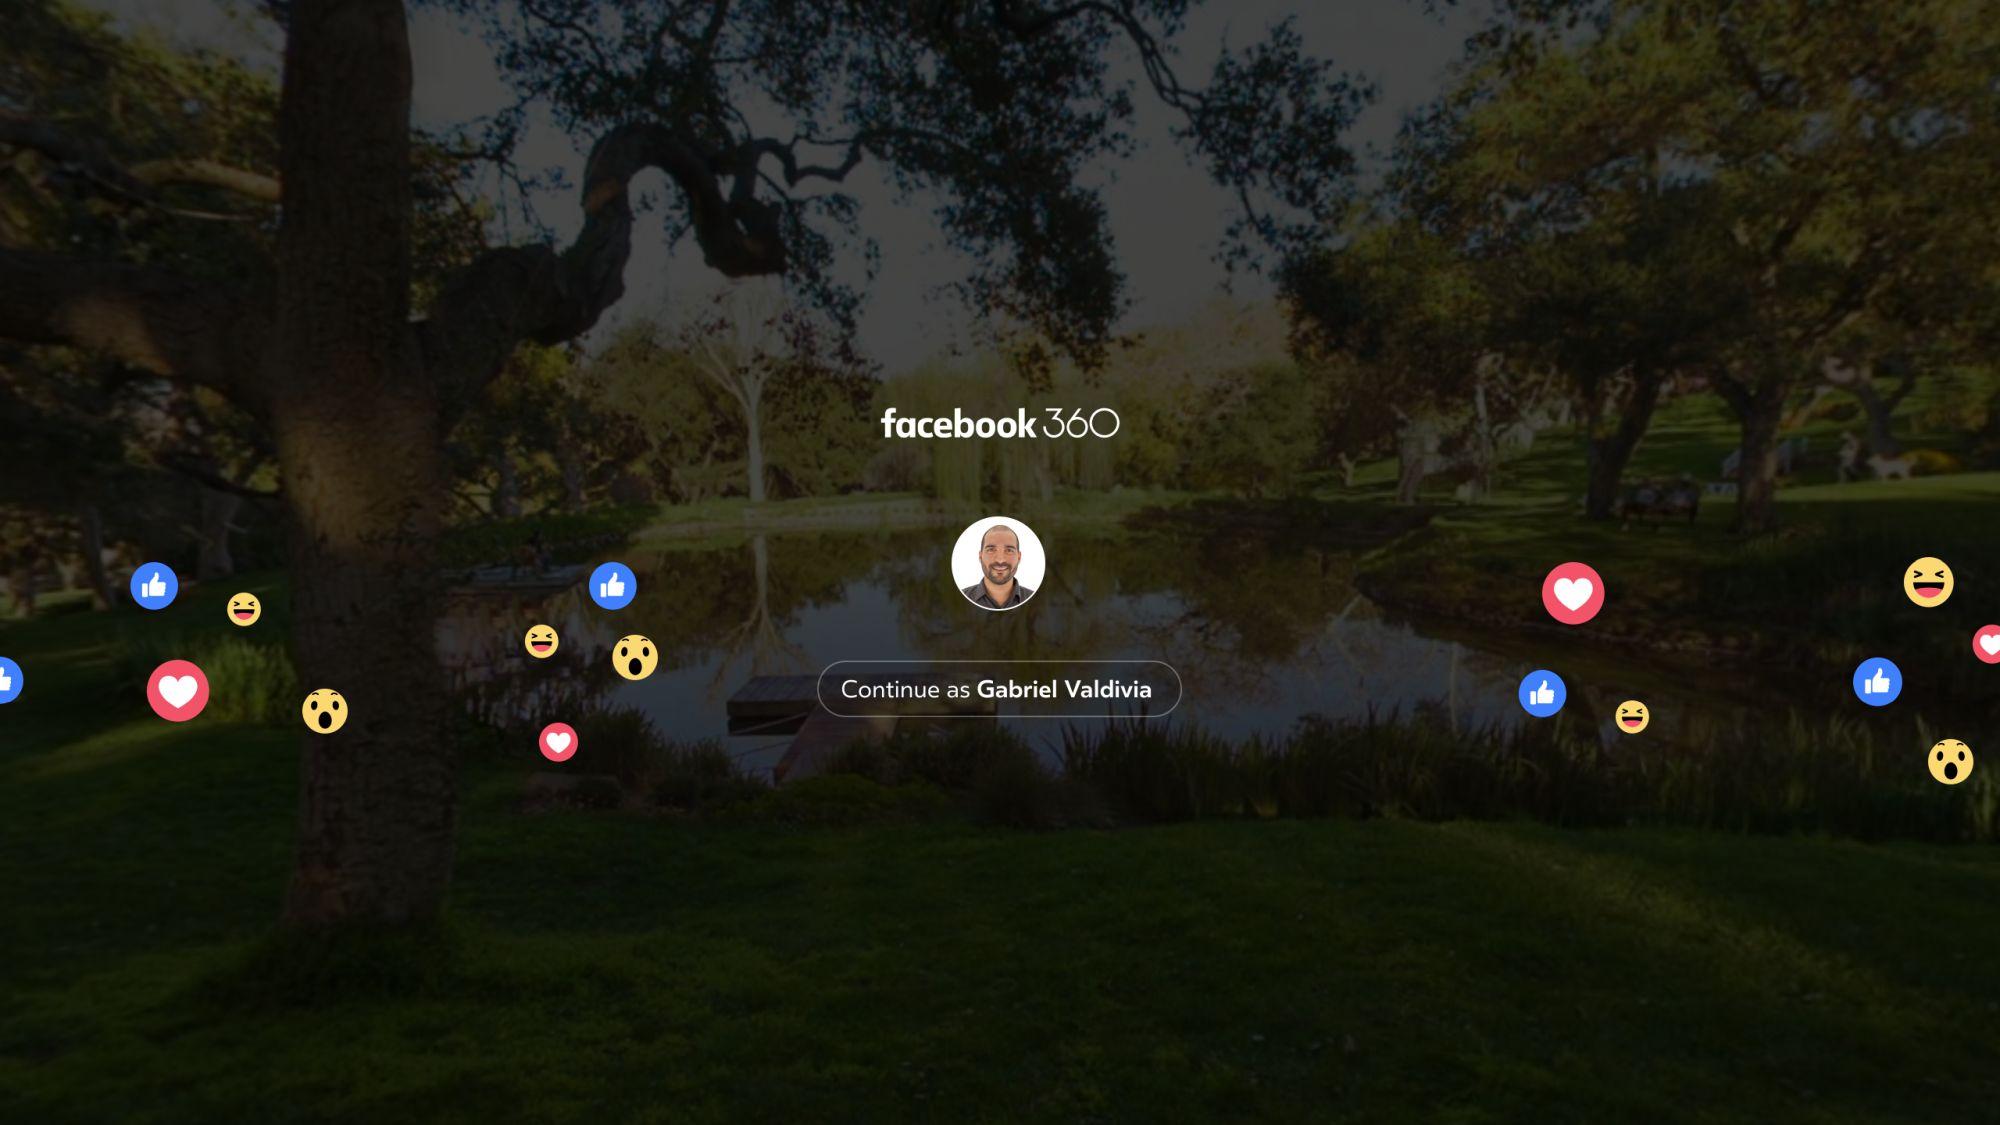 Facebook 360